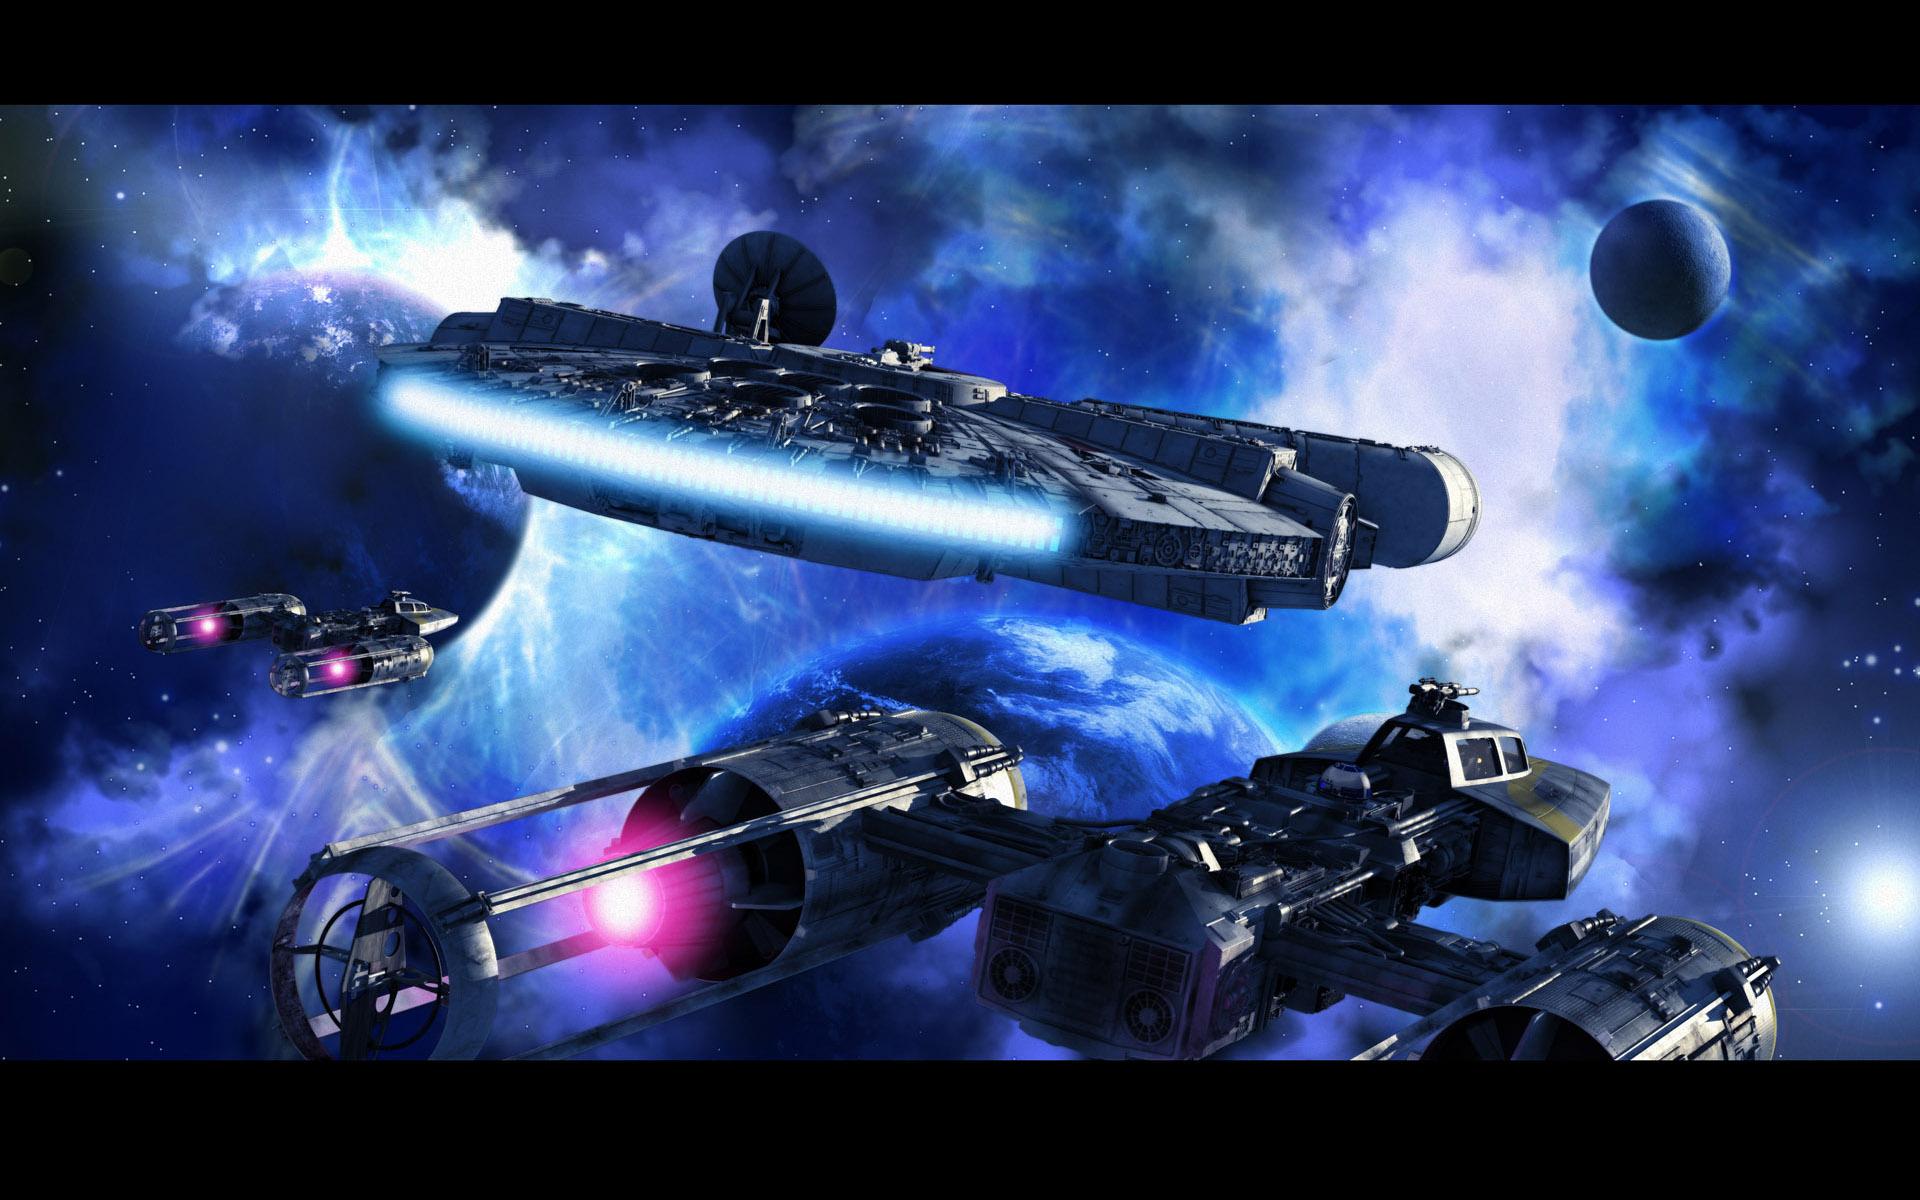 Star Wars movies sci-fi futuristic space planets wallpaper | 1920x1200 ...